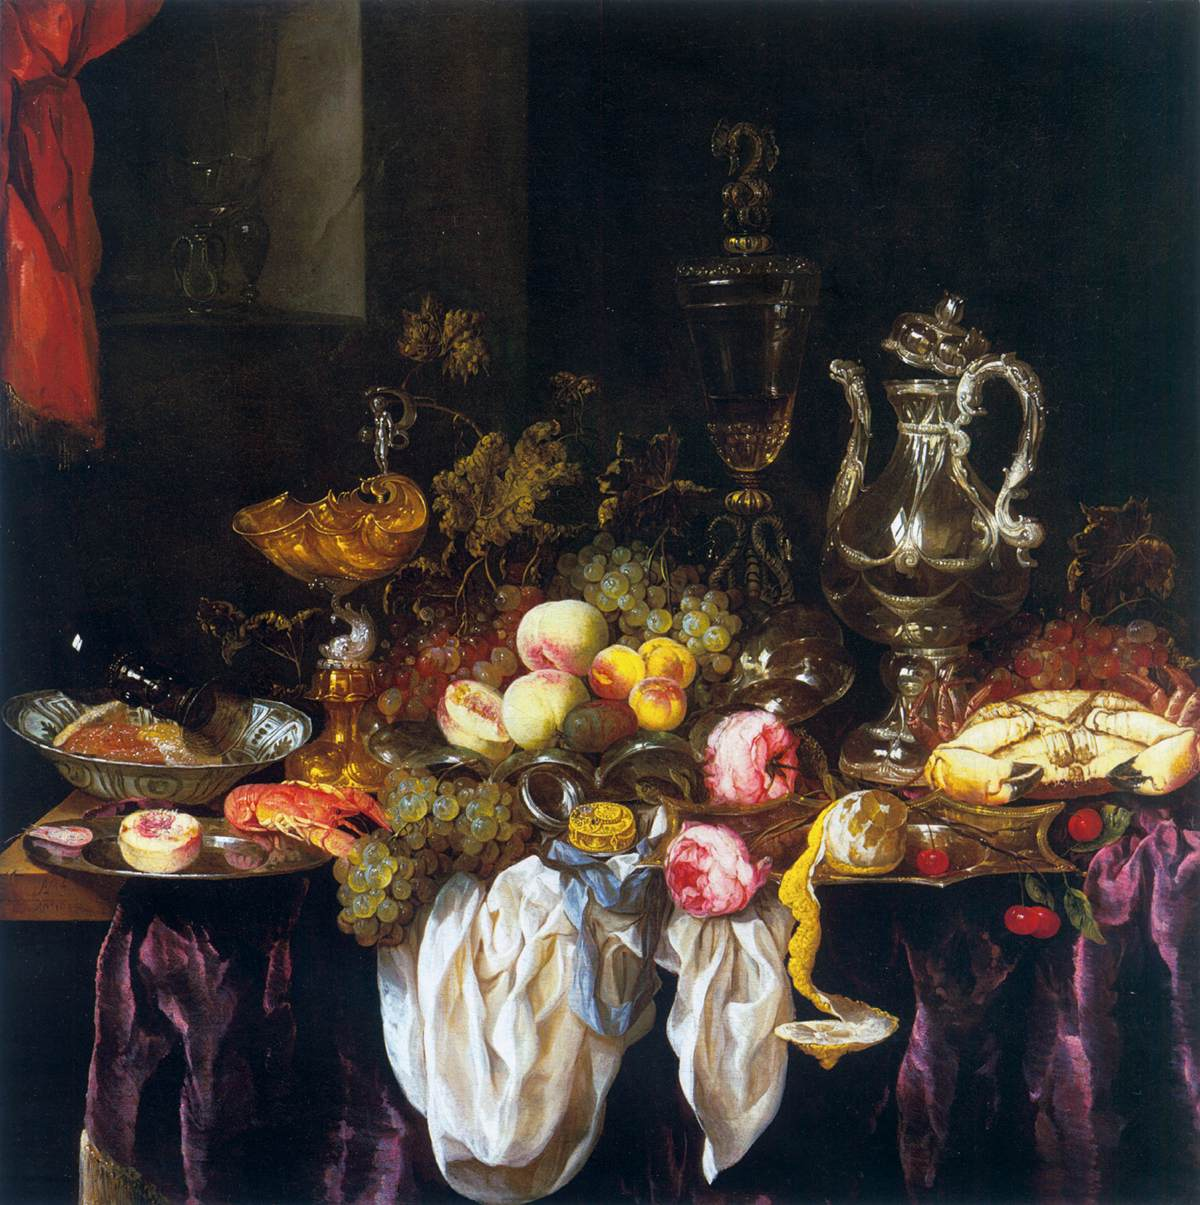 Fileabraham Van Beyeren Still Life With Fruit Sea Food And